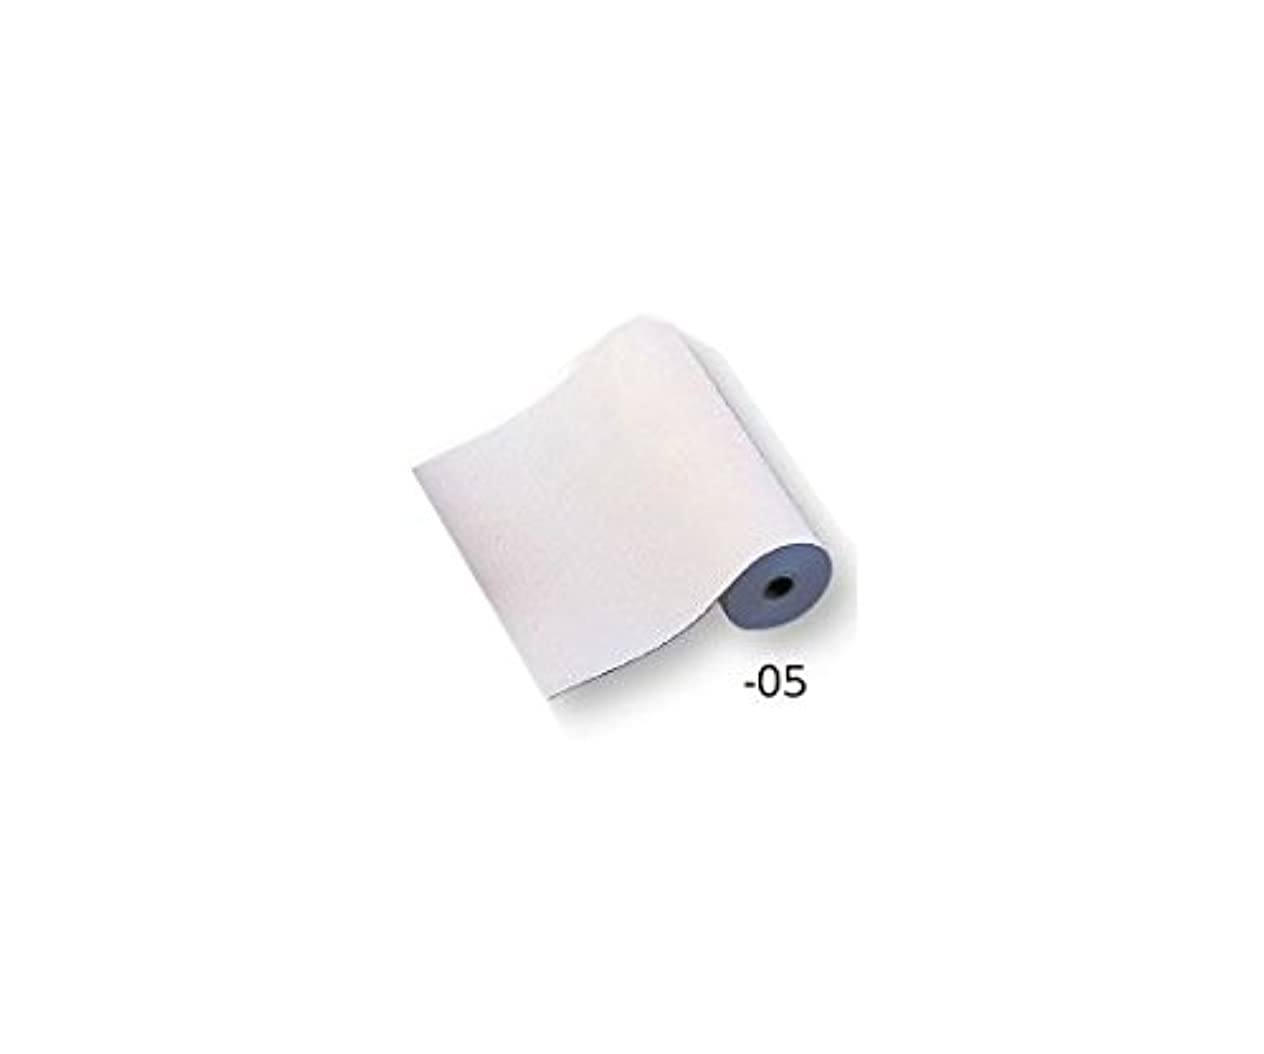 闘争物理学者テンポ8-9024-05心電計用紙RQS210-6(K)10巻入